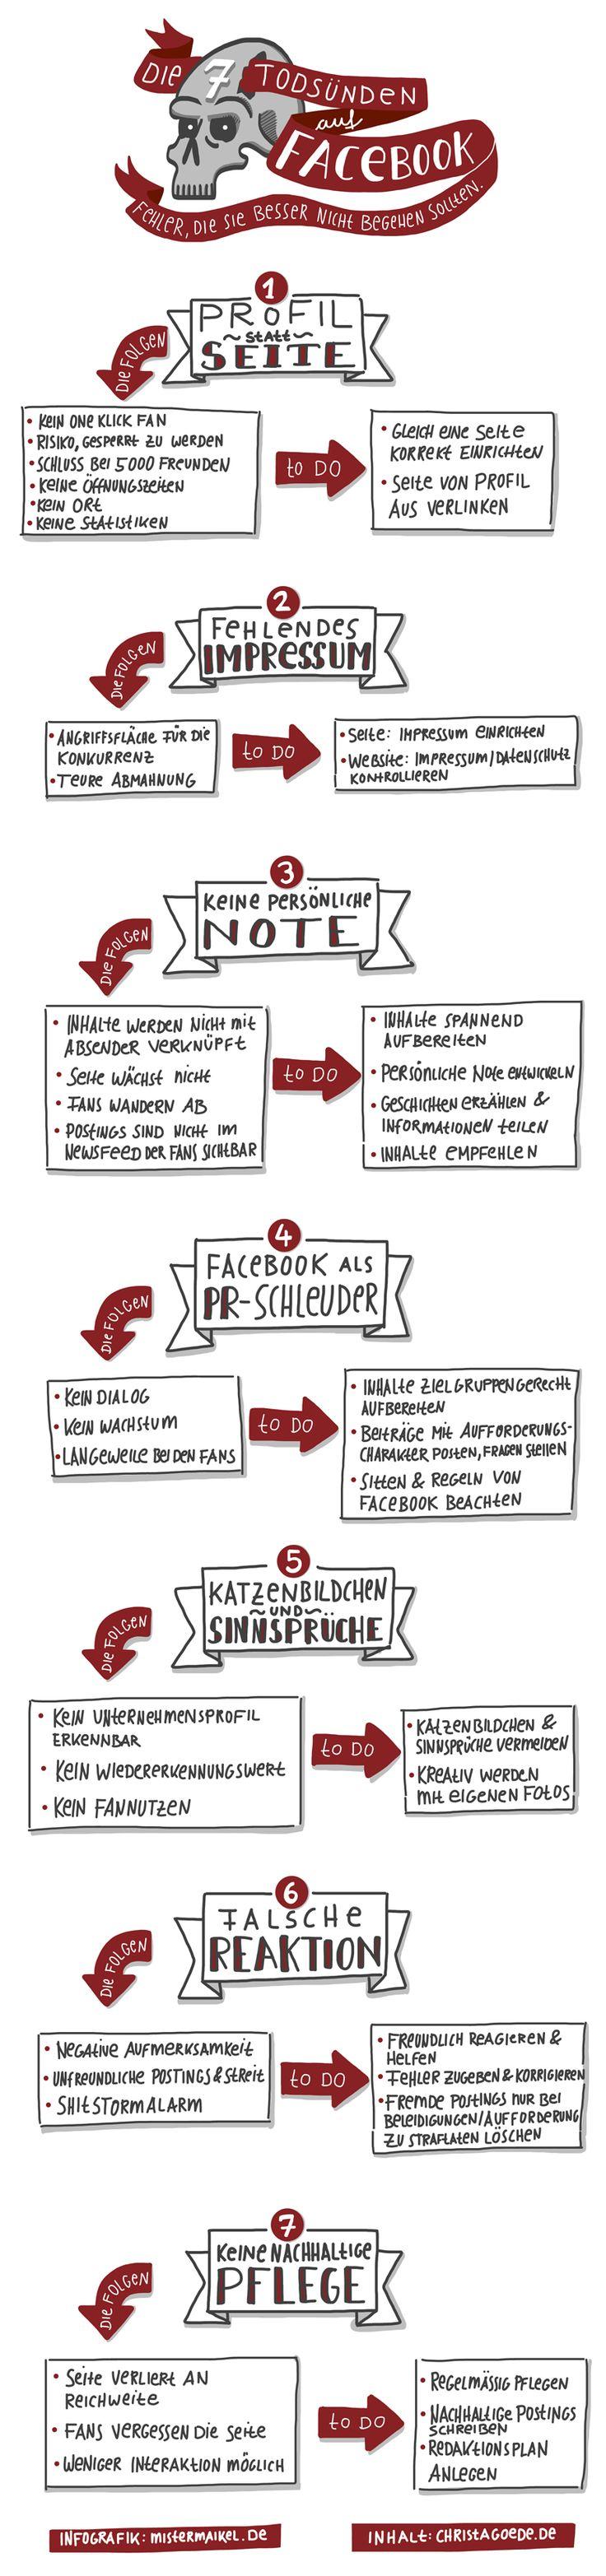 7 Todsünden auf Facebook - Infografik  http://www.christagoede.de/infografik-die-7-todsuenden-auf-facebook/